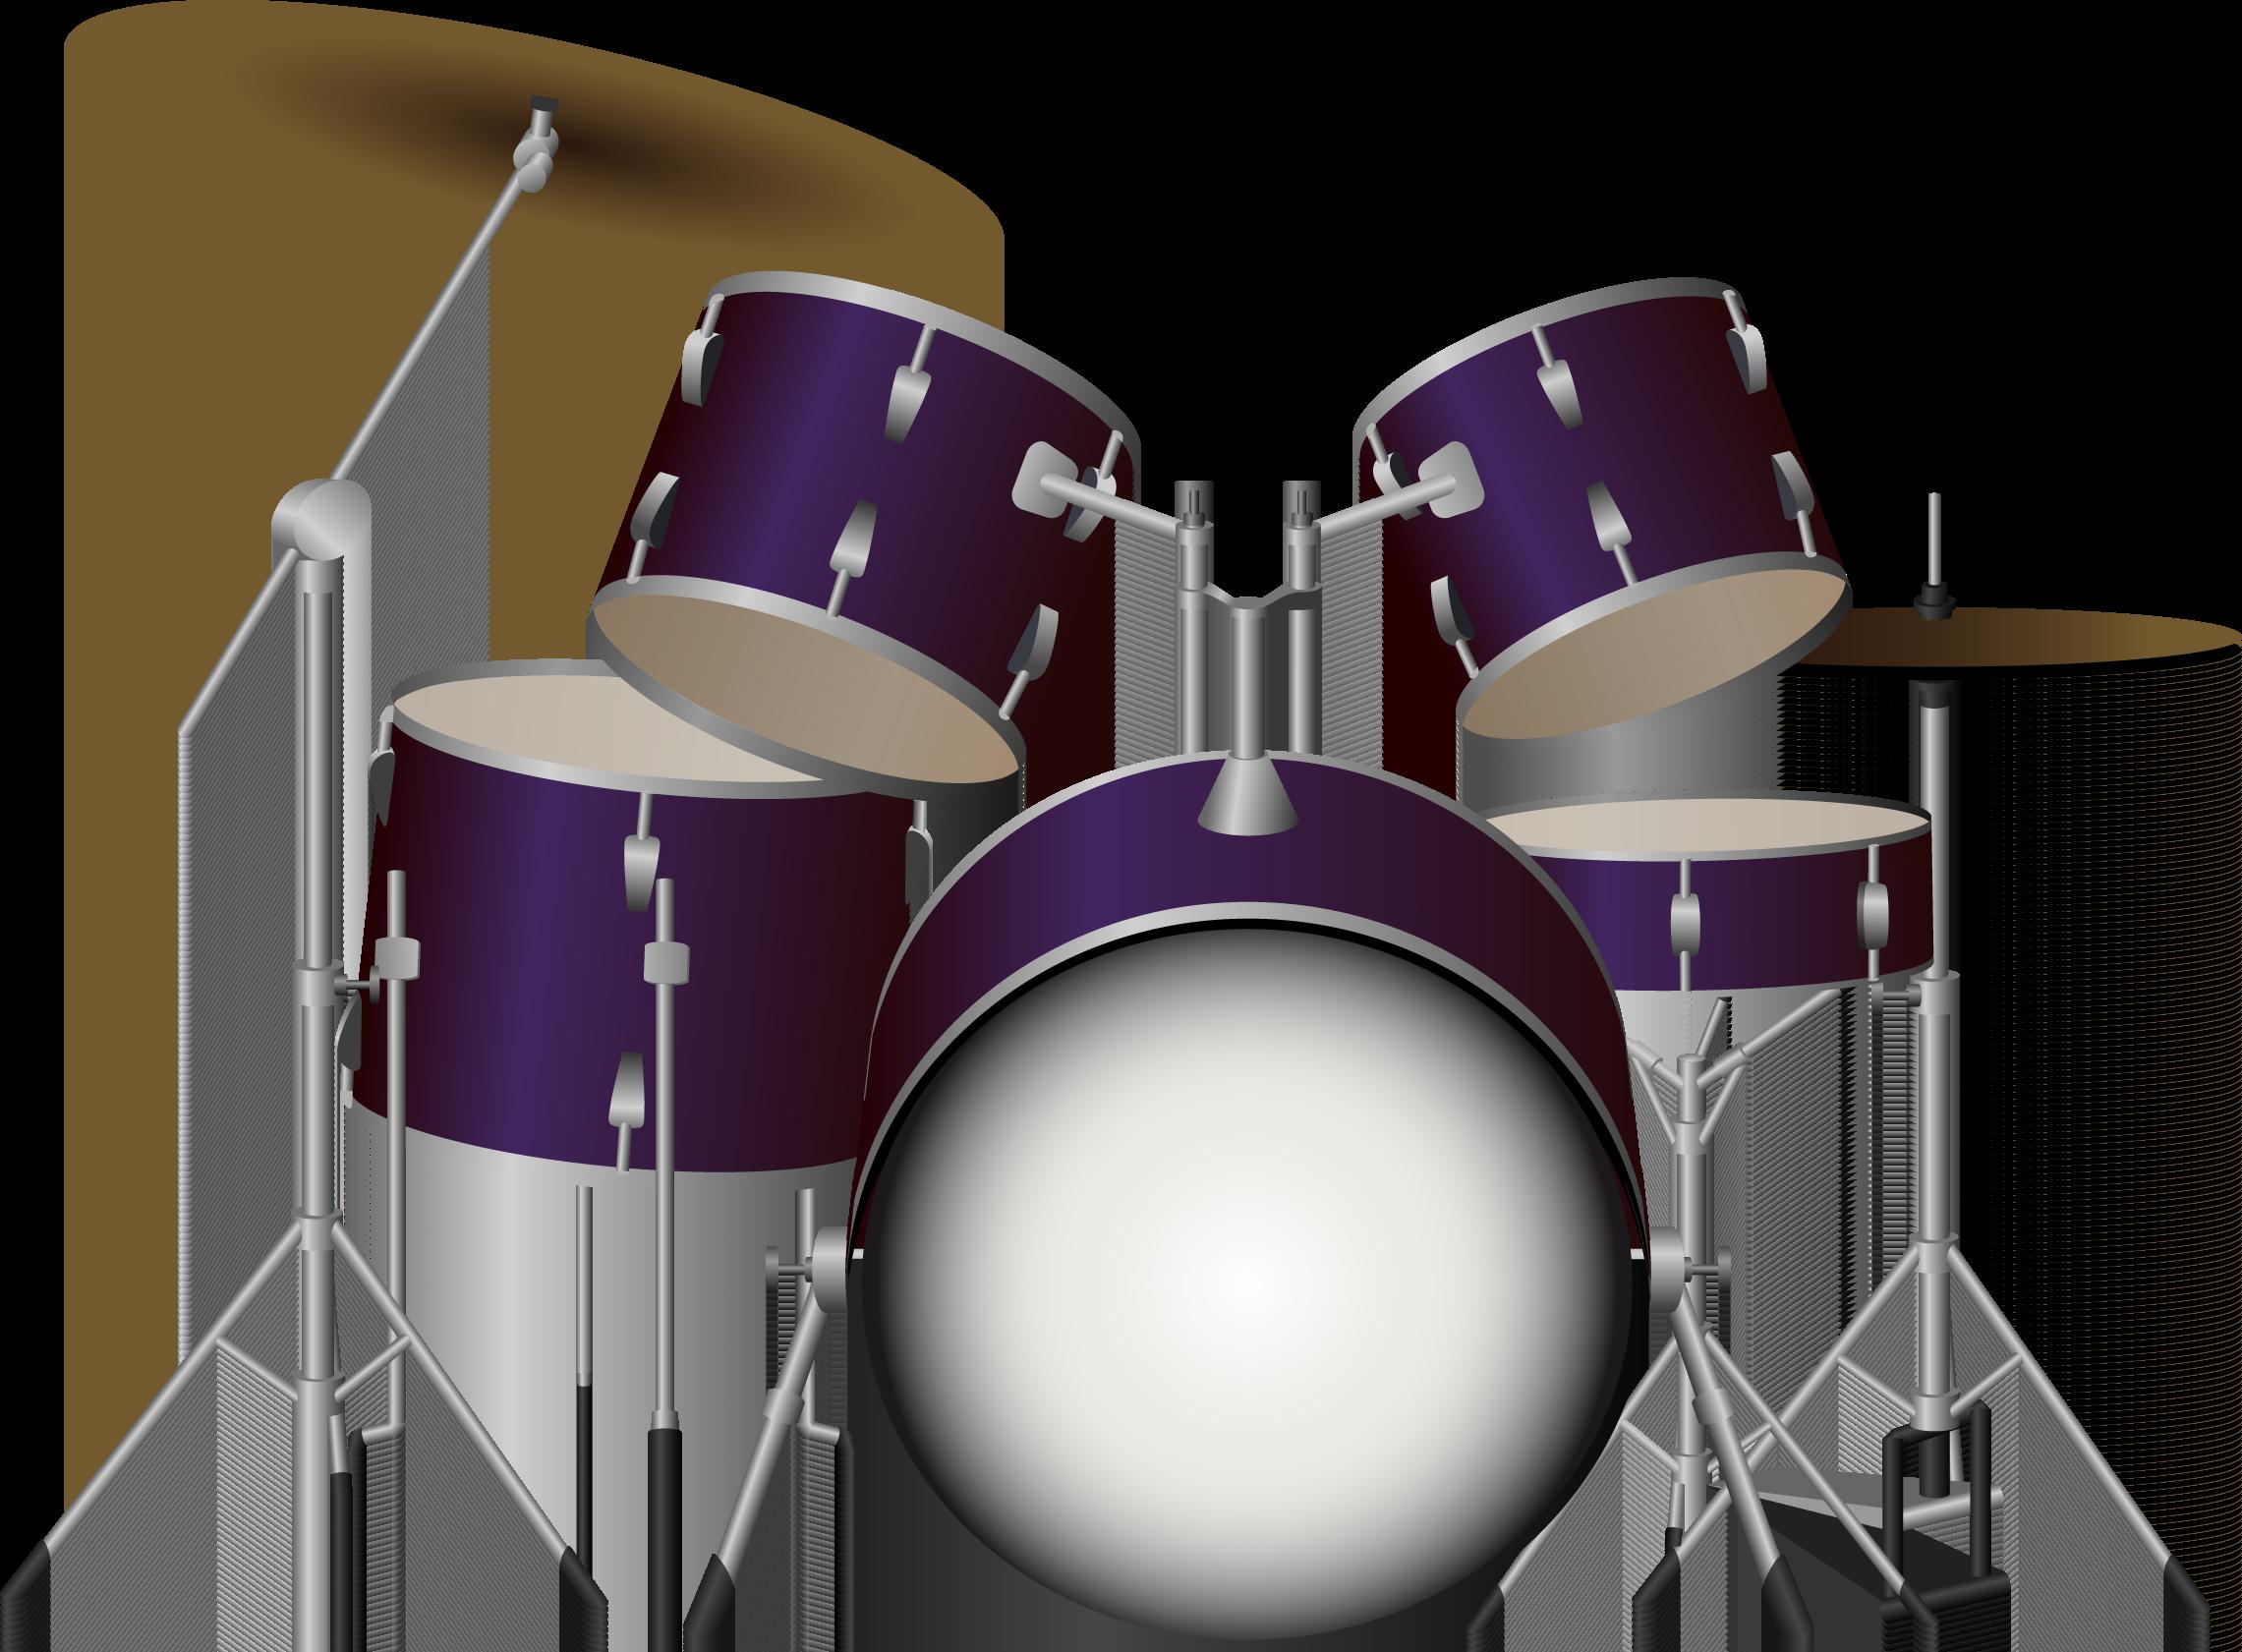 Red clipart drum set. Drums kit png image